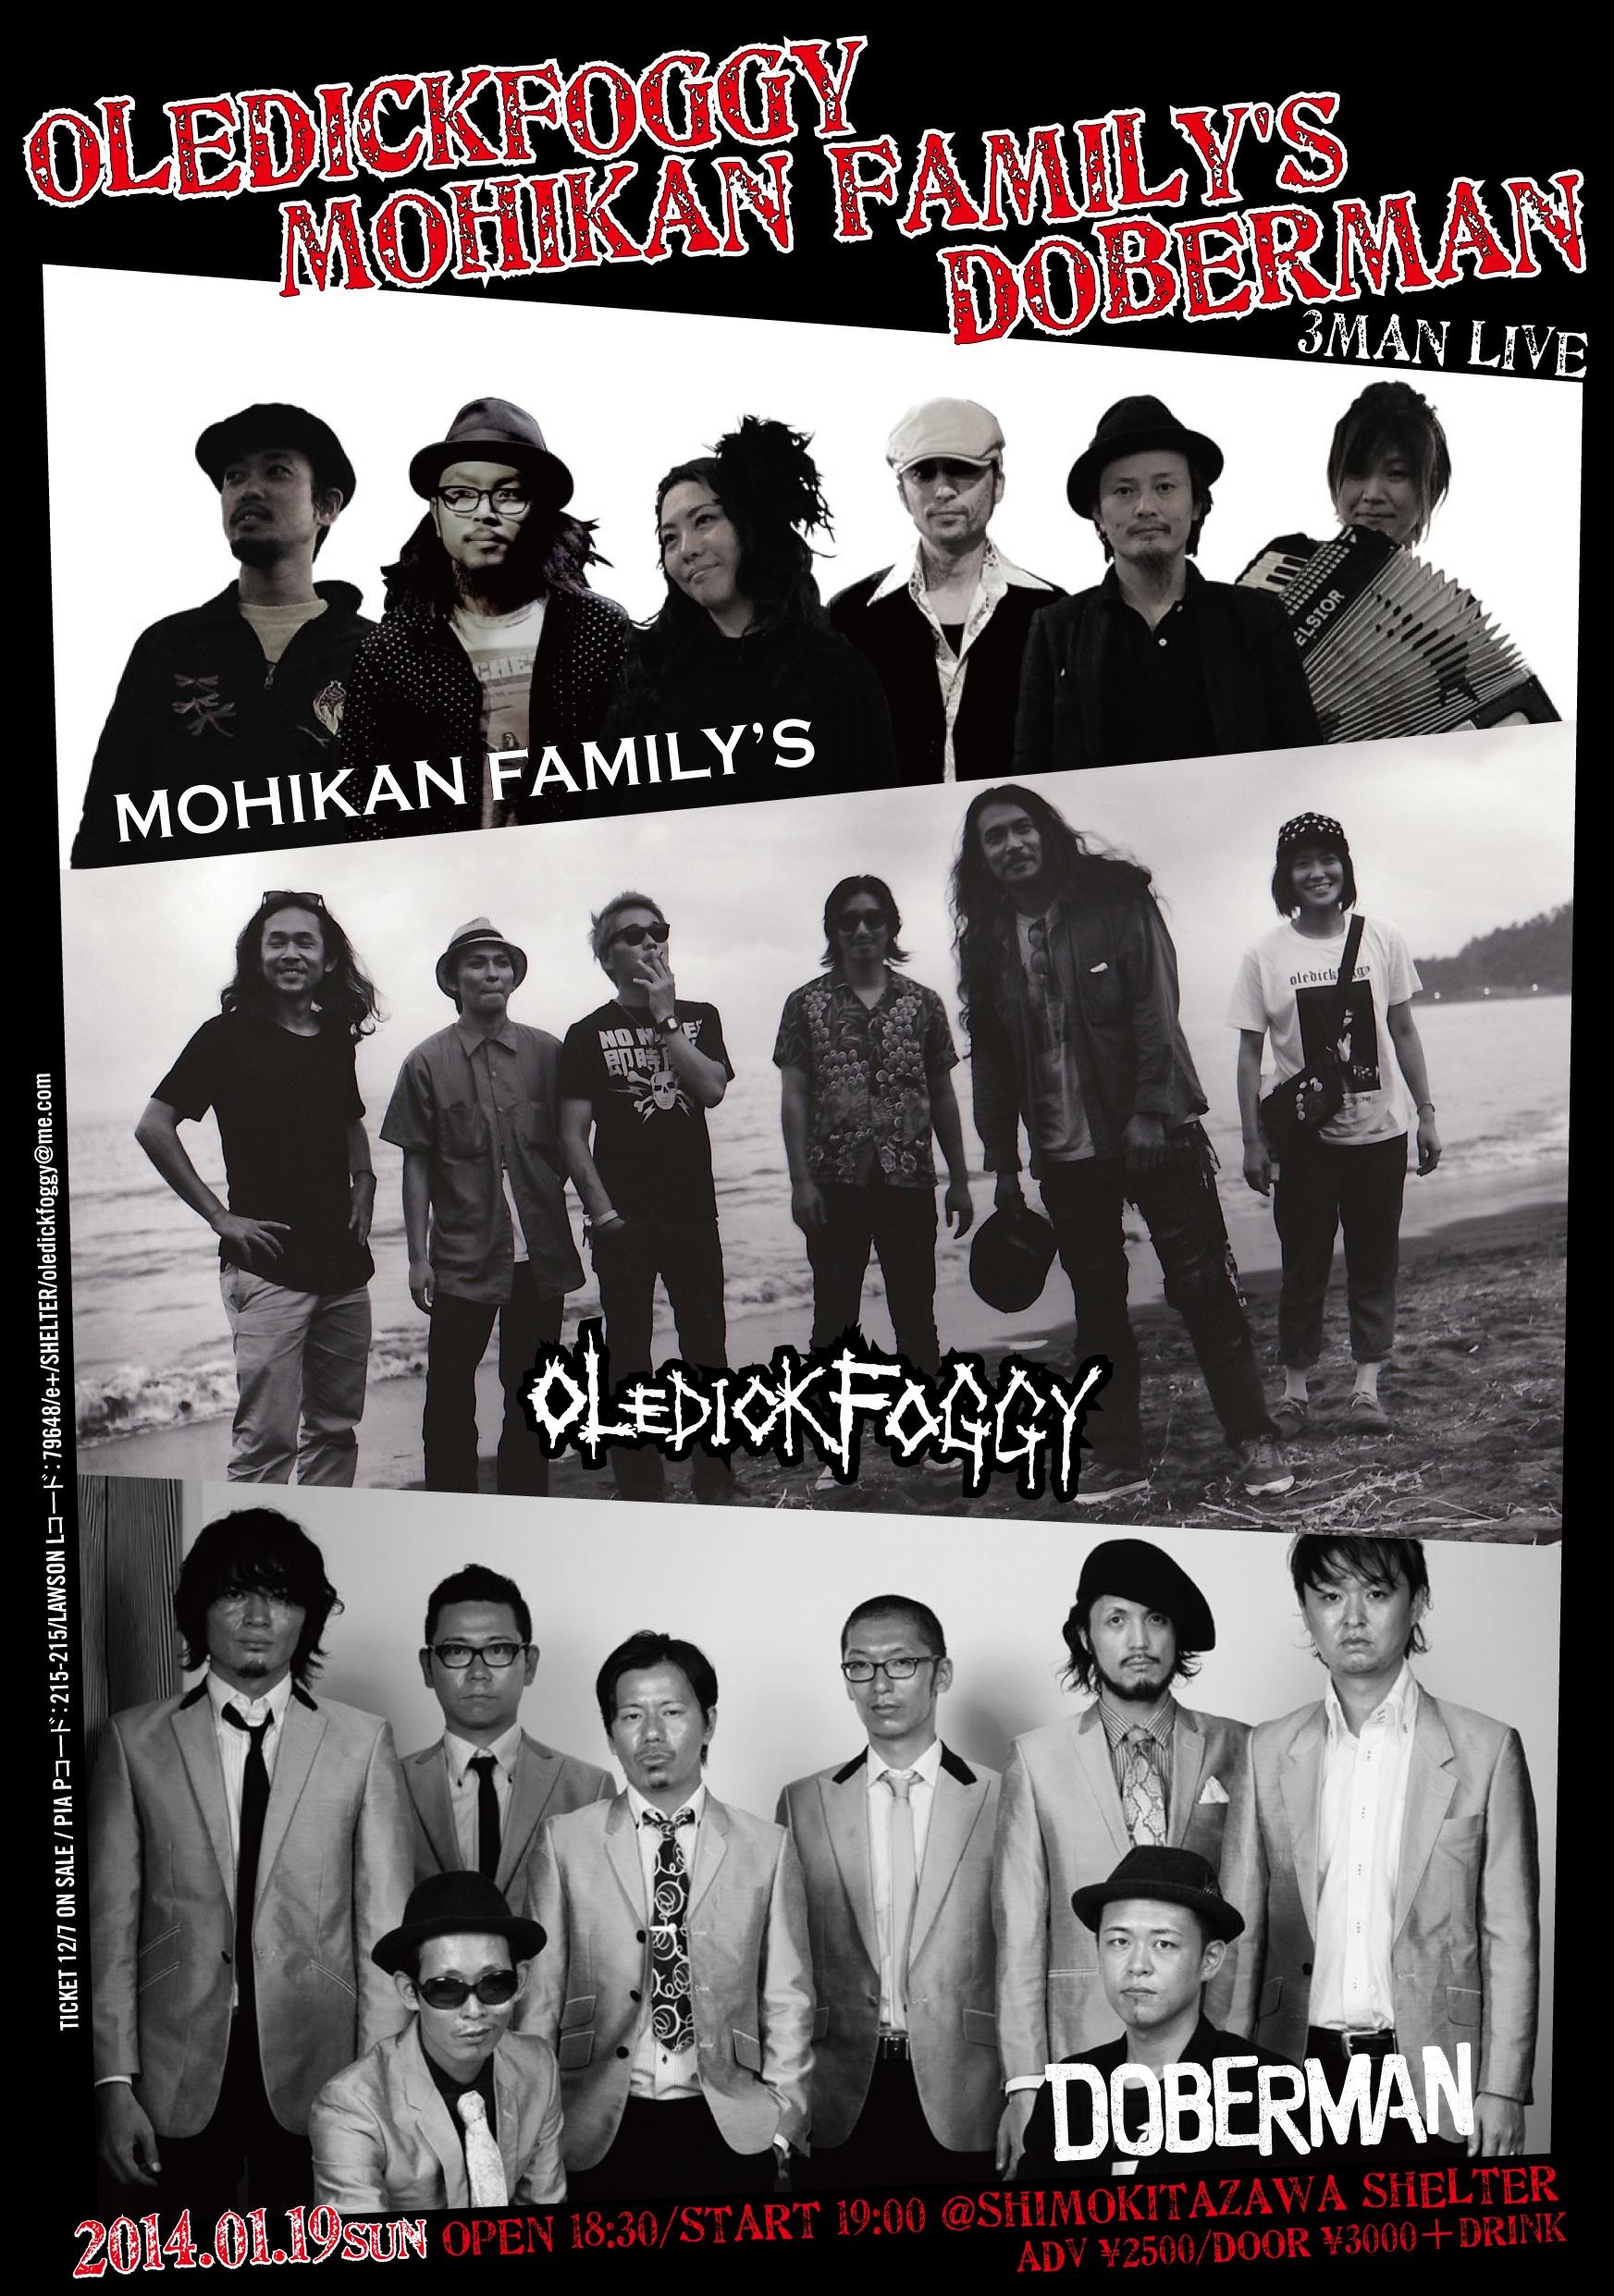 OLEDICKFOGGY×DOBERMAN×MOHIKAN FAMILY'S 3MAN LIVE